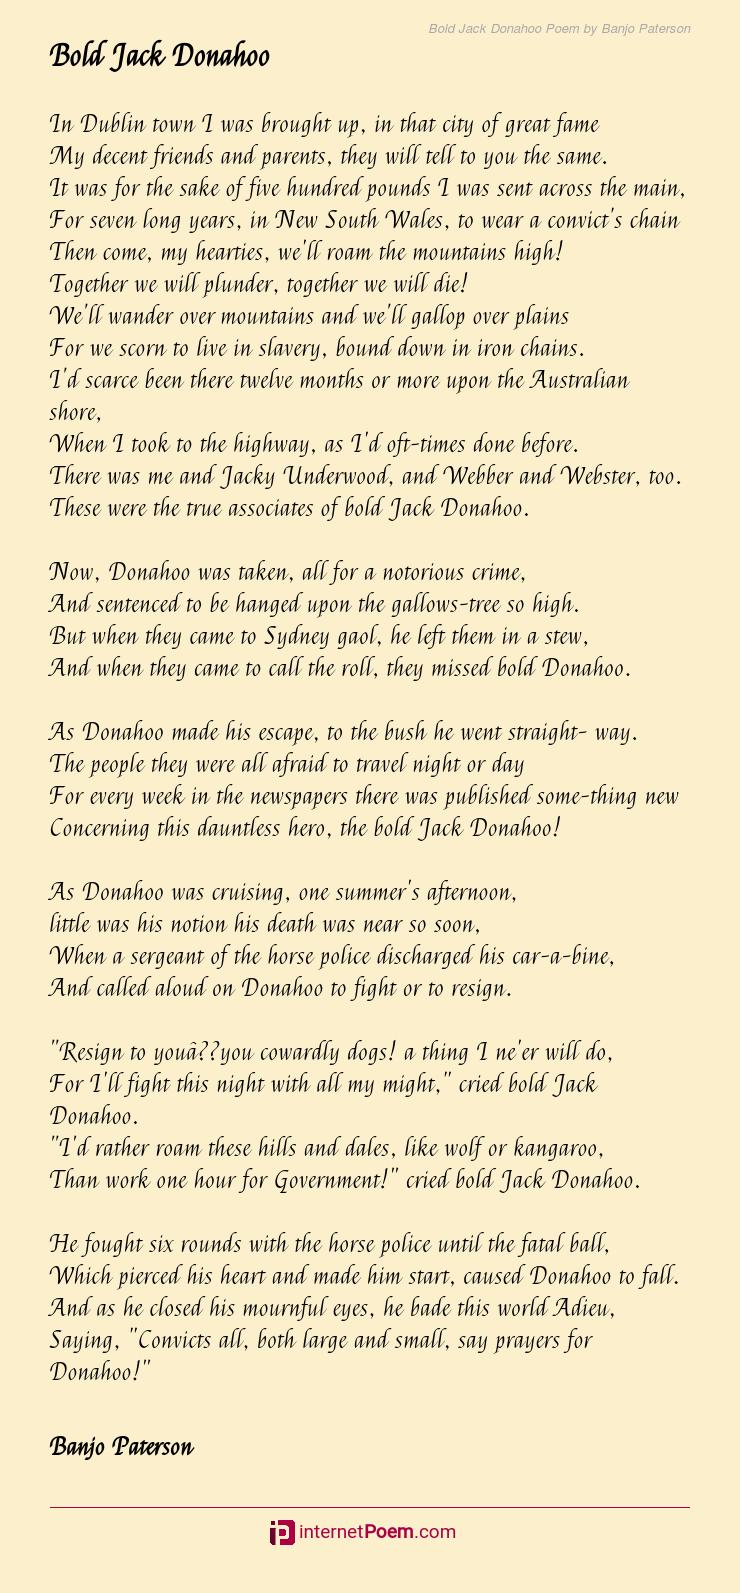 Bold Jack Donahoo Poem By Banjo Paterson